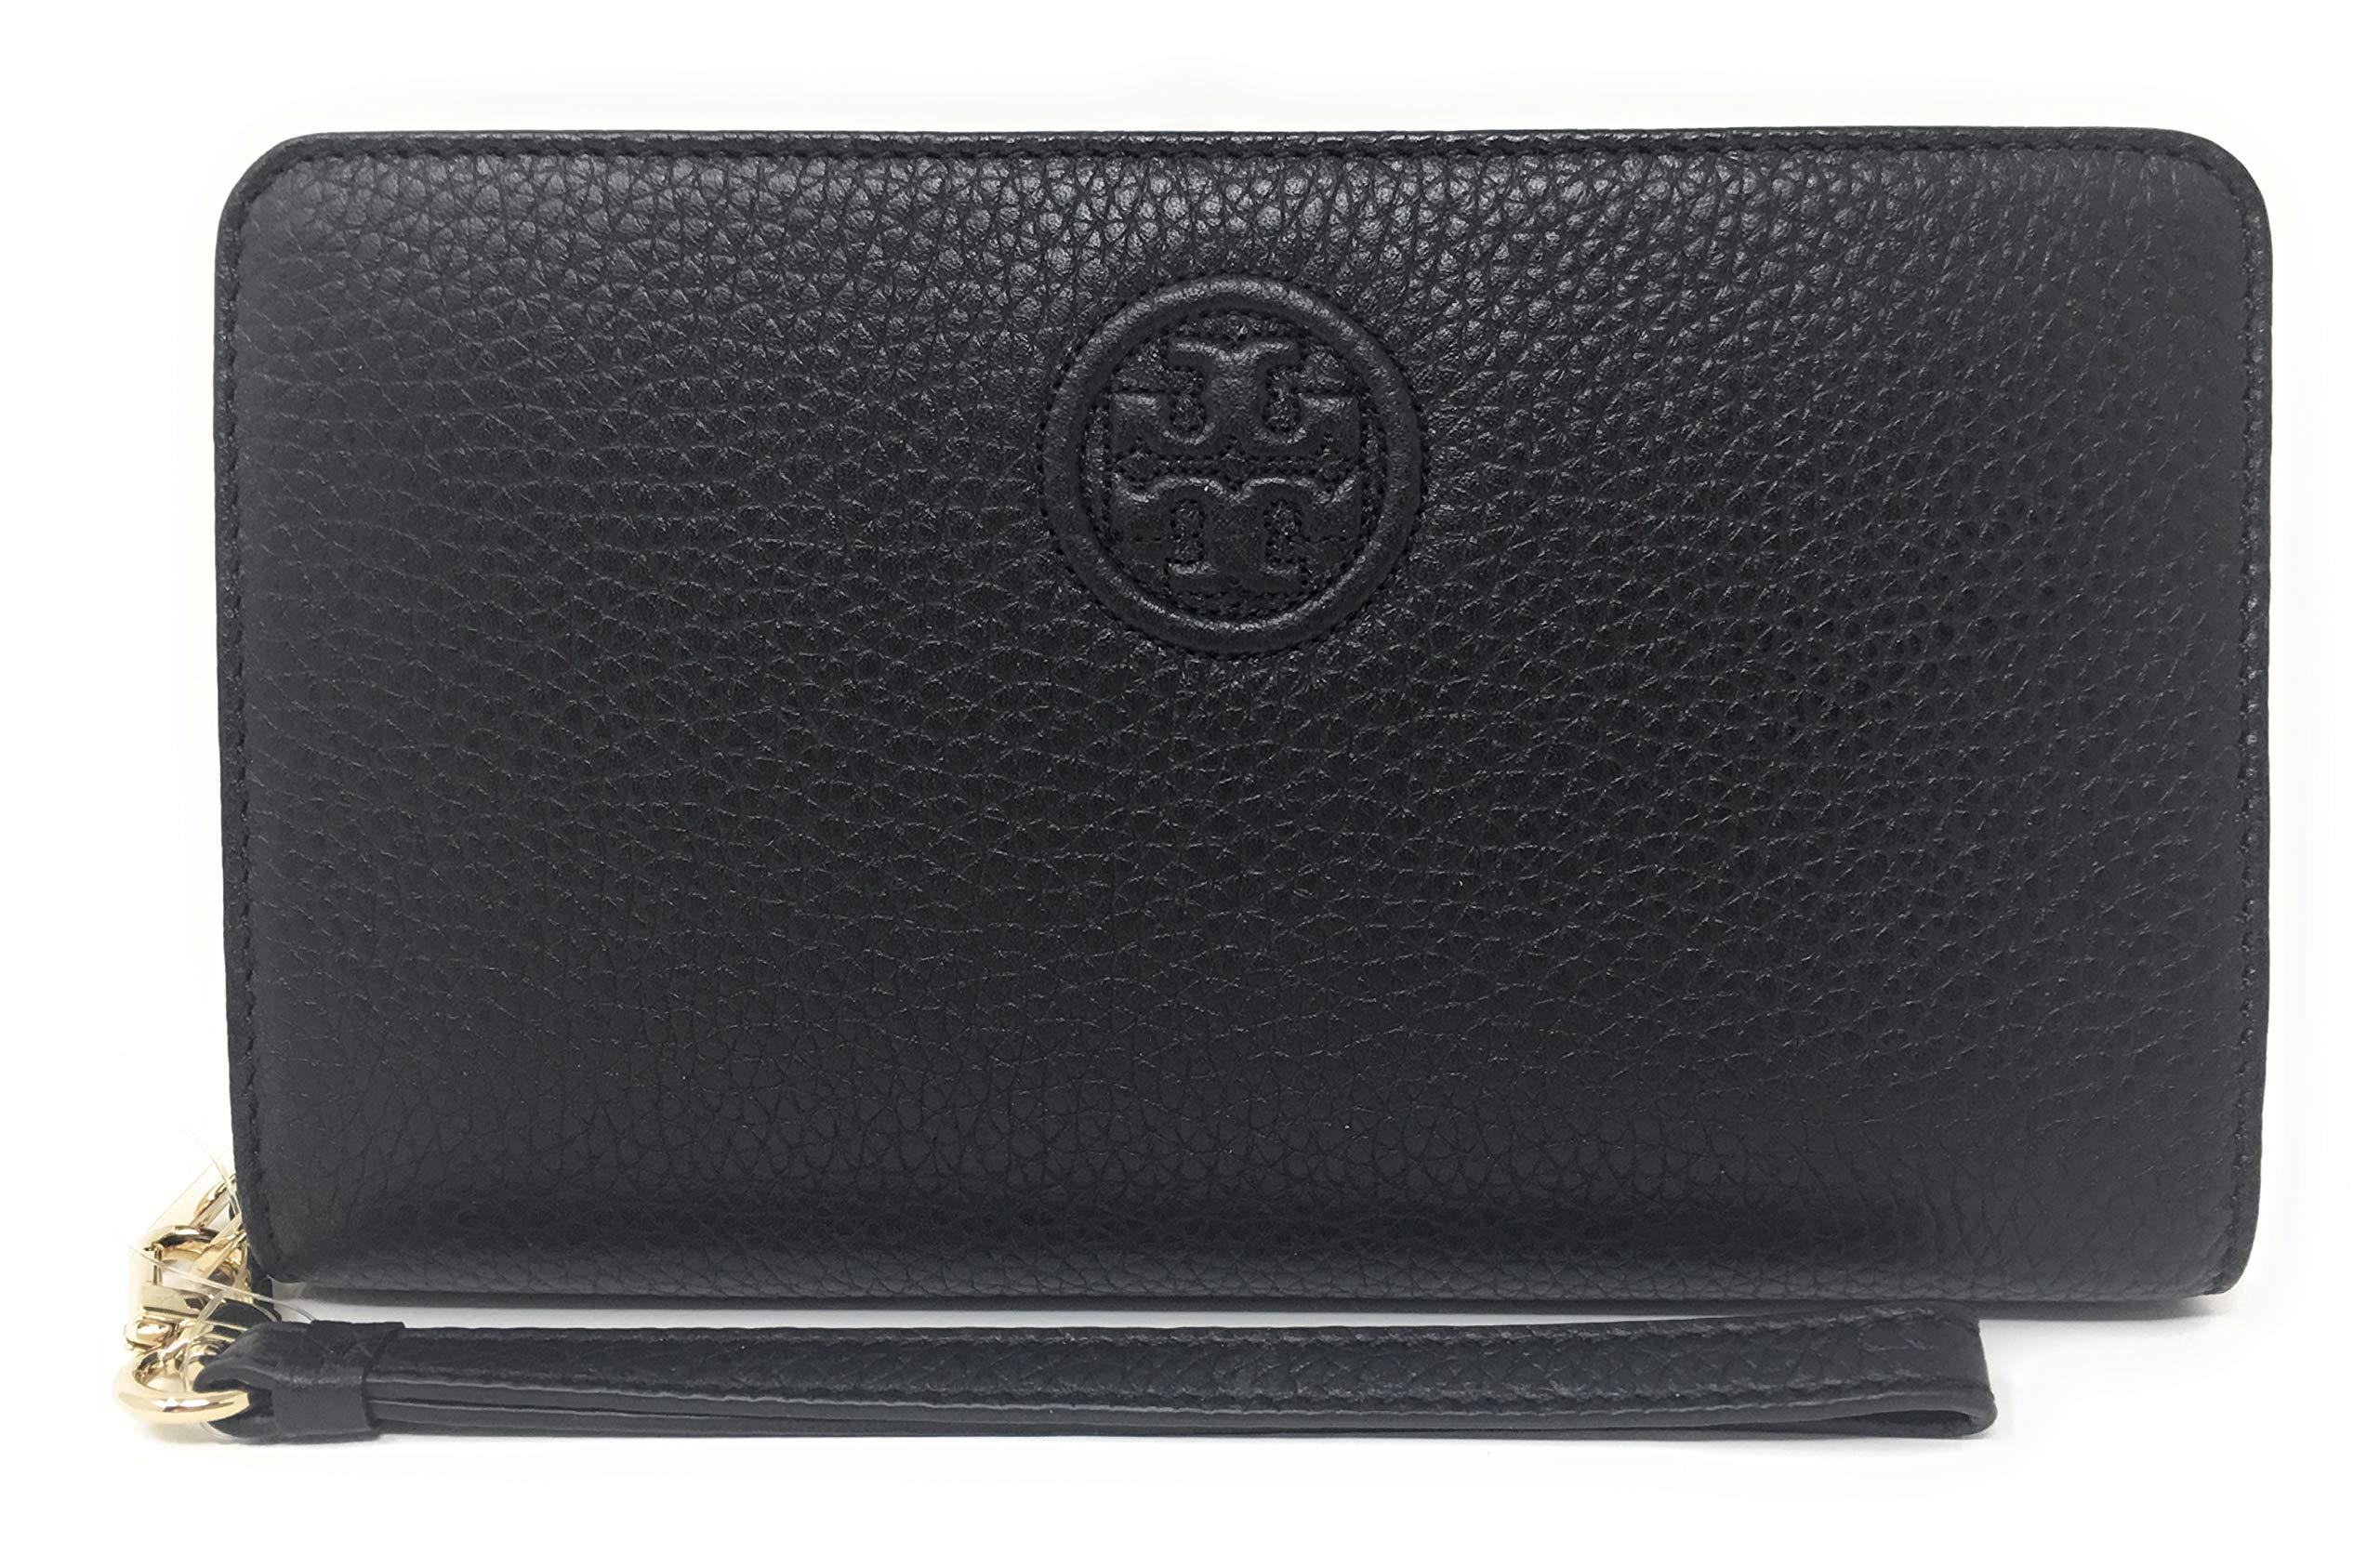 Tory Burch Women's Bombe Smartphone Leather Wristlet (Black)